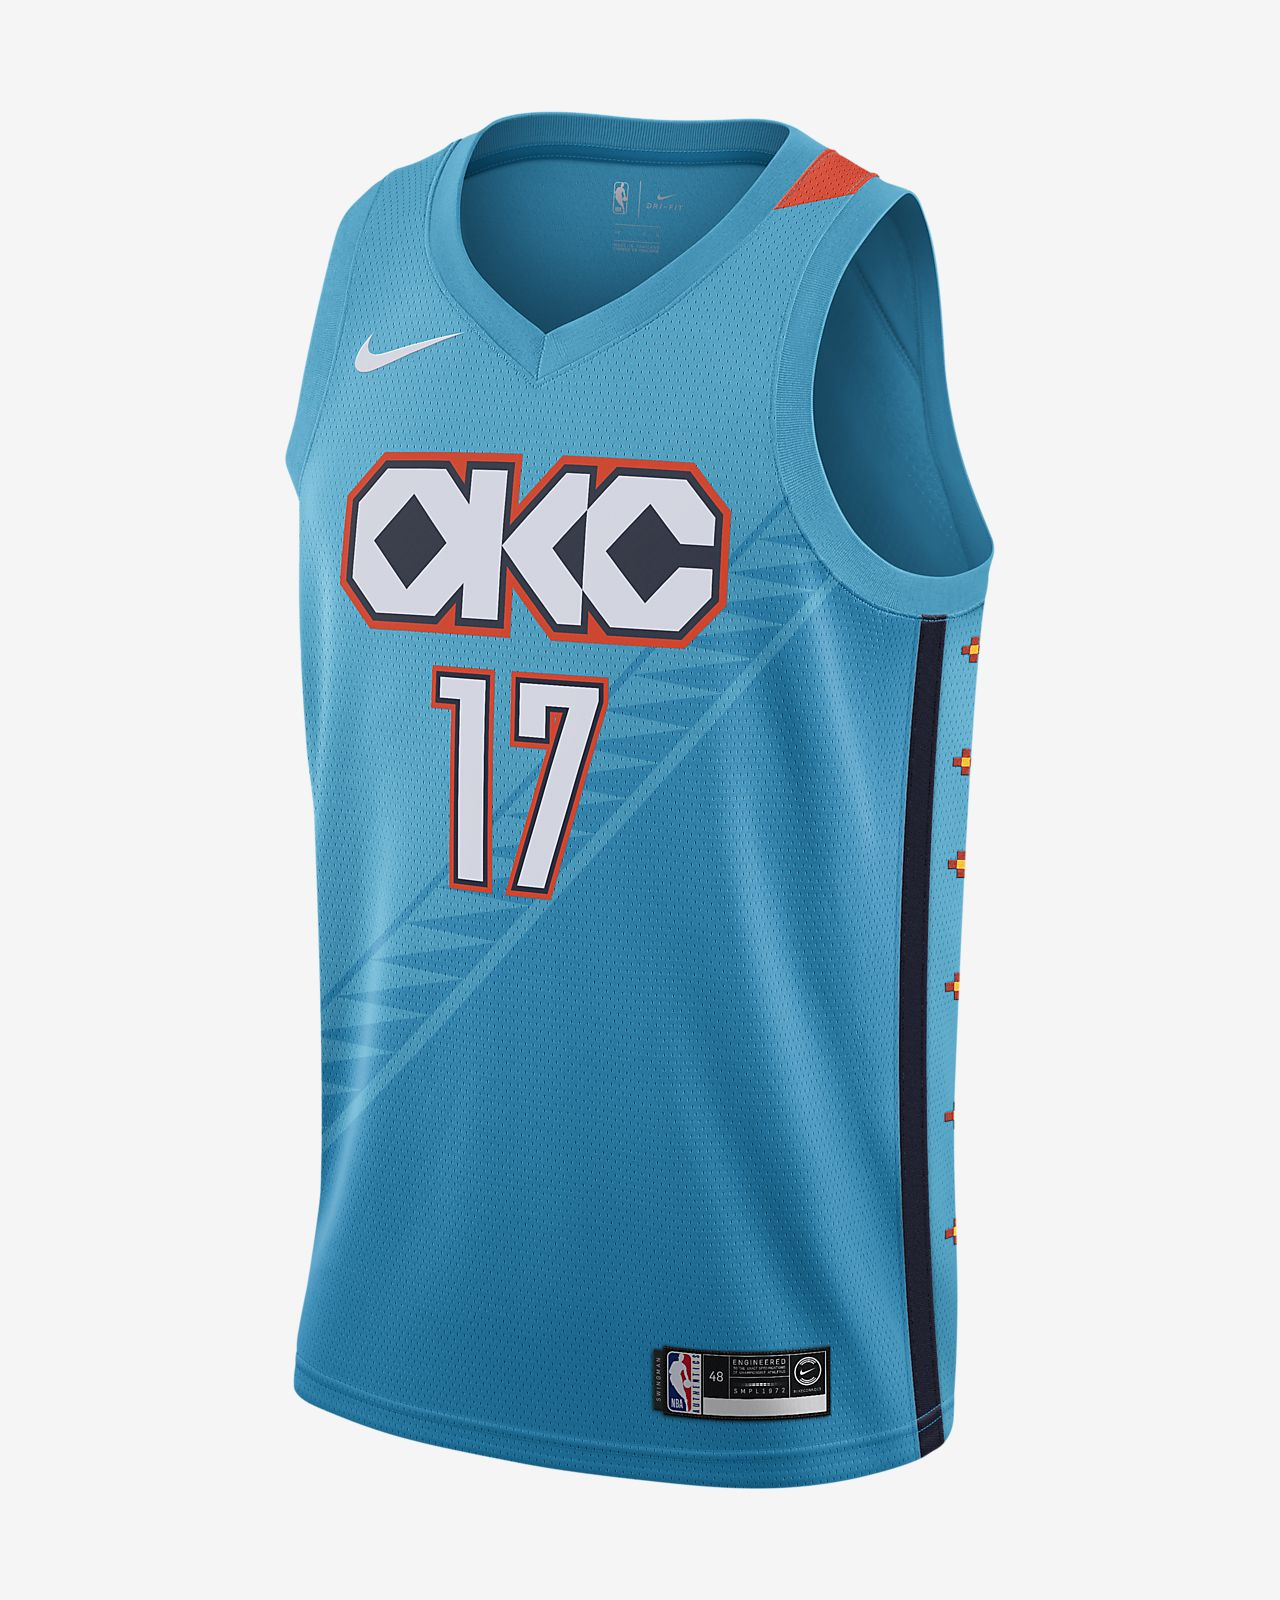 0063d1a37 City Edition Swingman (Oklahoma City Thunder) Men s Nike NBA ...